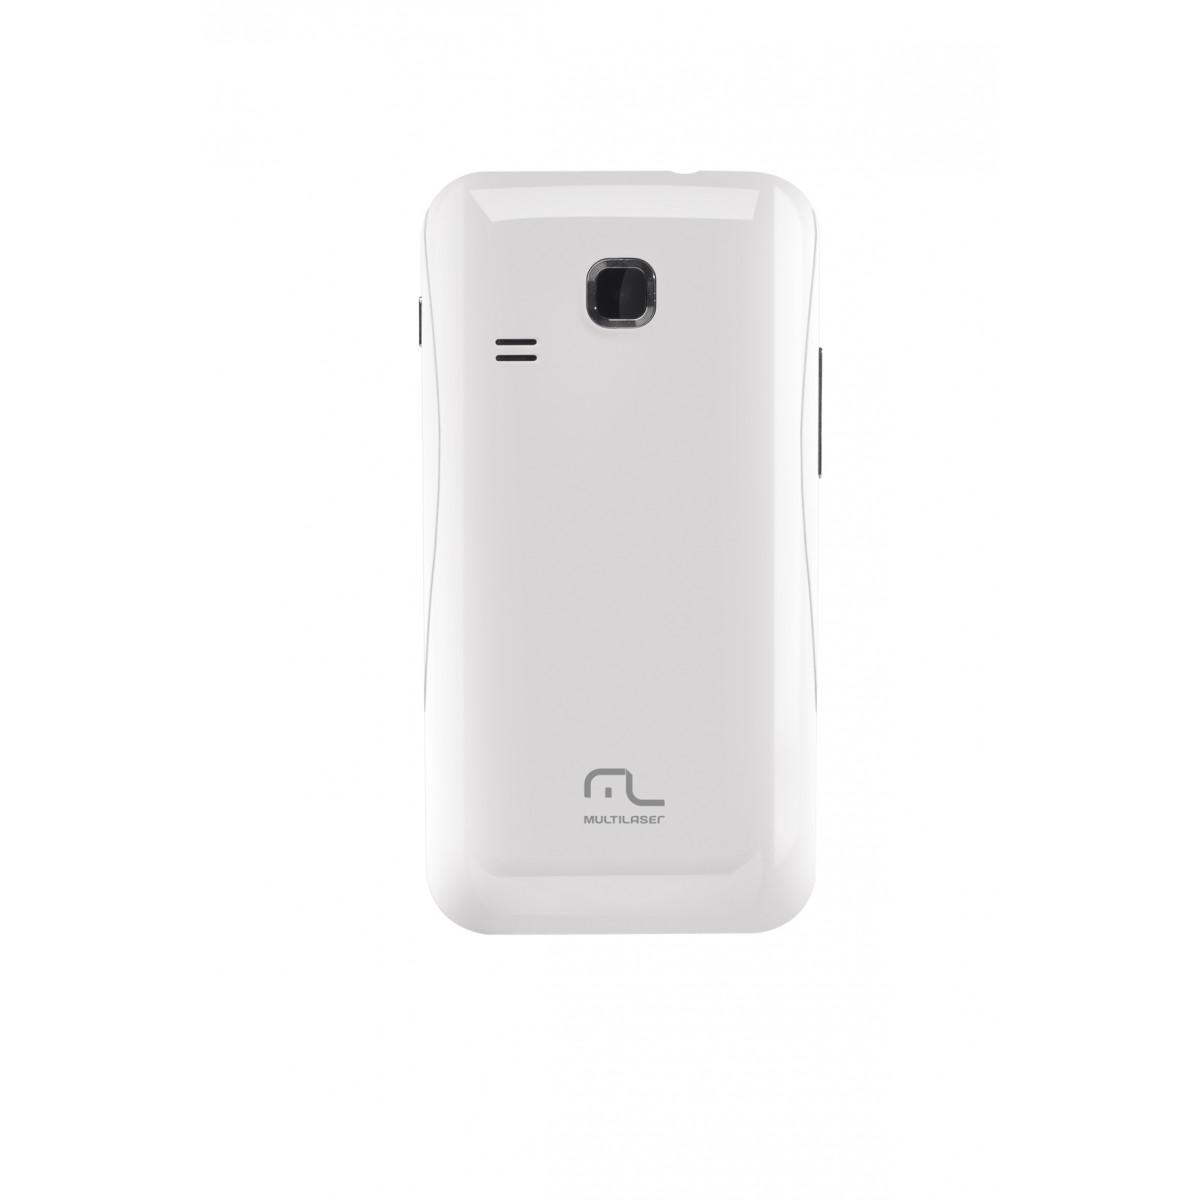 Smartphone Multilaser Dual Chip P3182 3G Android 2.3 Processador 1.0Ghz Tela de 3.5p Branco